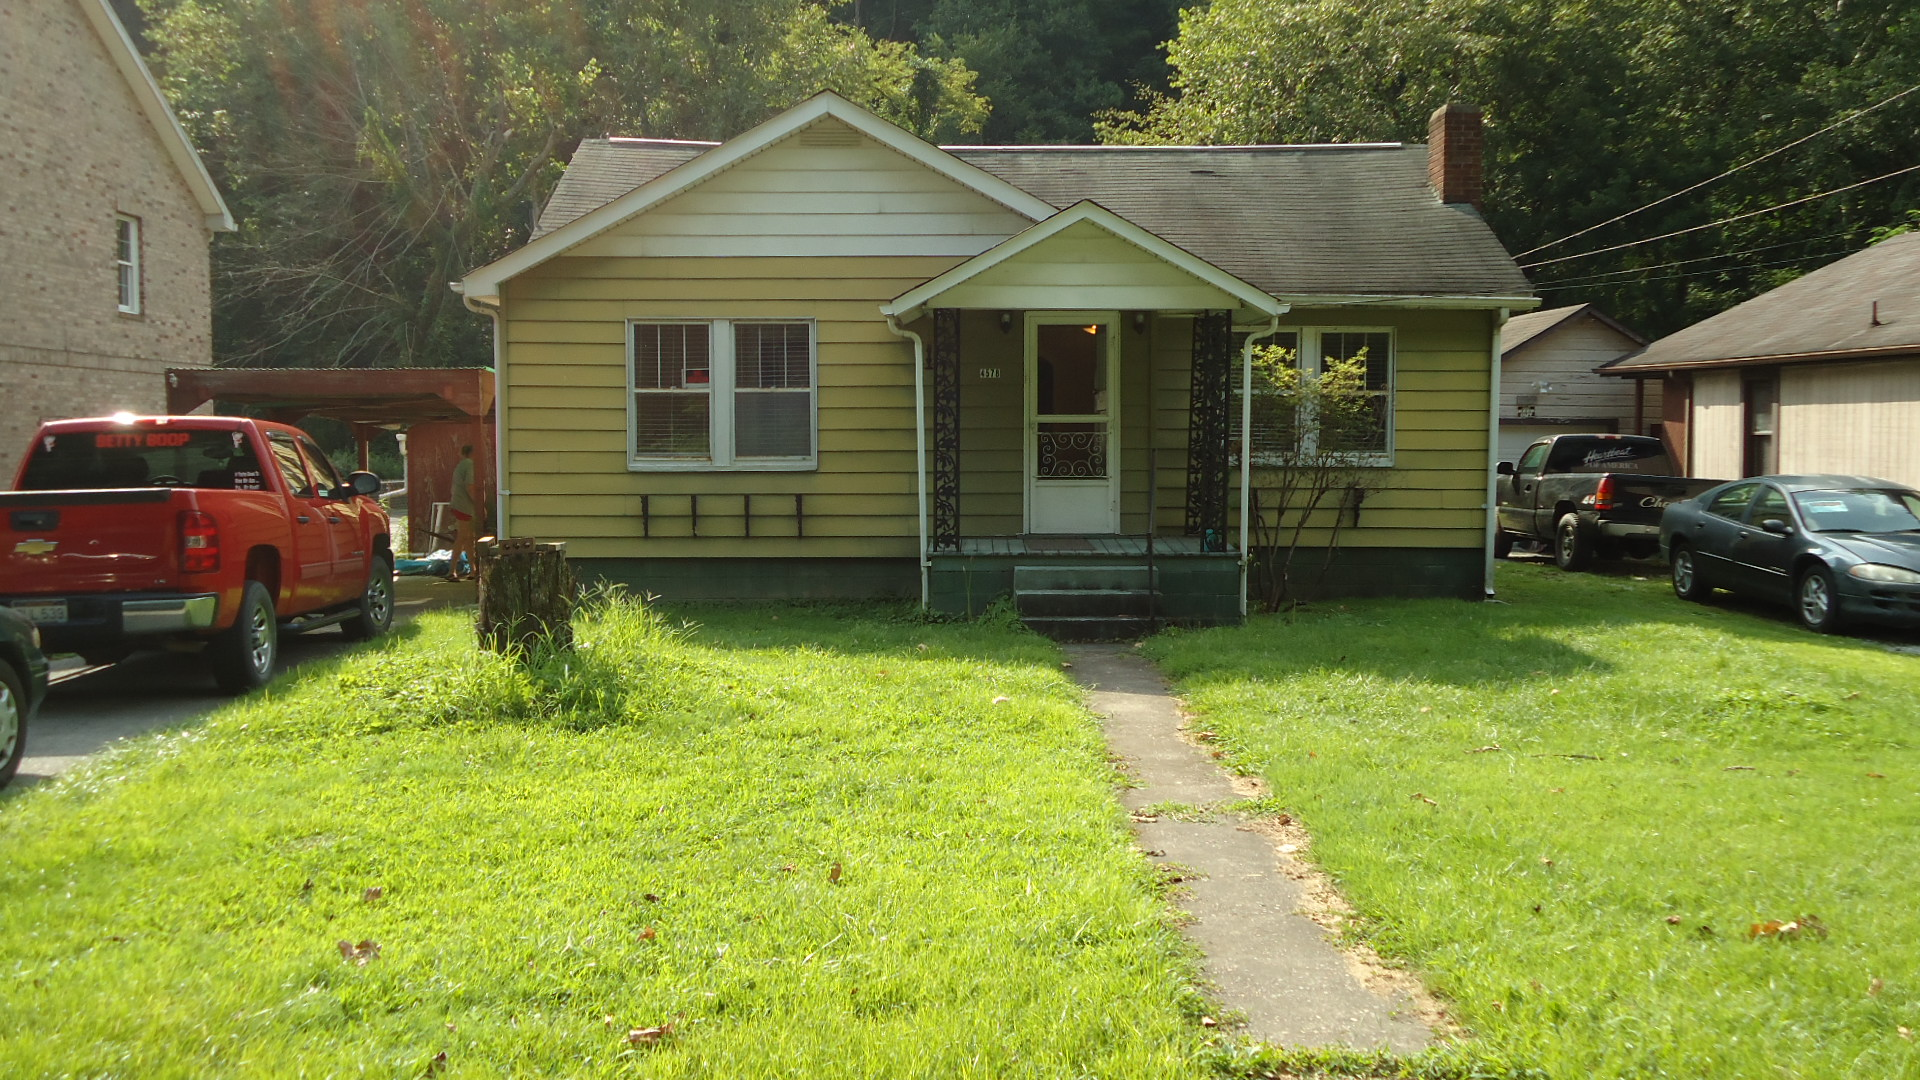 4578 Jerry West Hwy., Switzer, West Virginia 25647